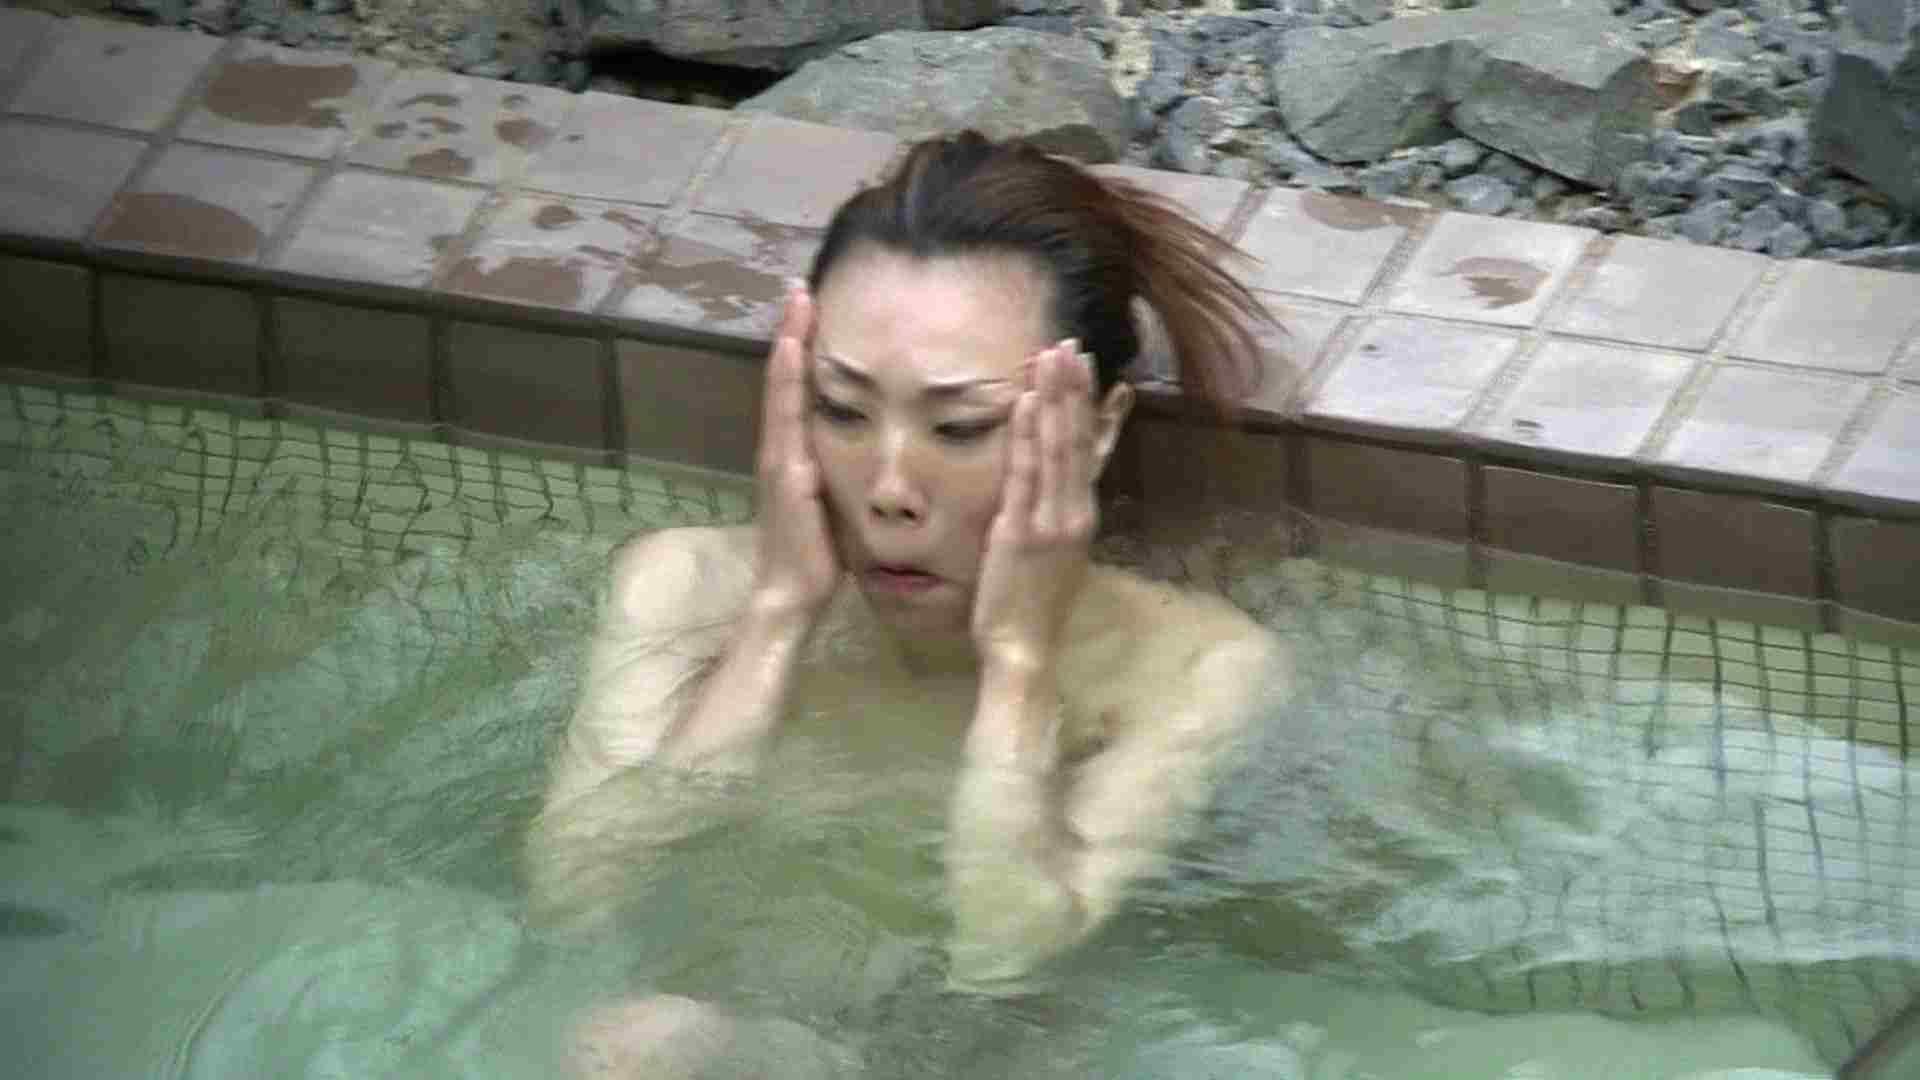 Aquaな露天風呂Vol.654 OLすけべ画像   盗撮  38連発 22